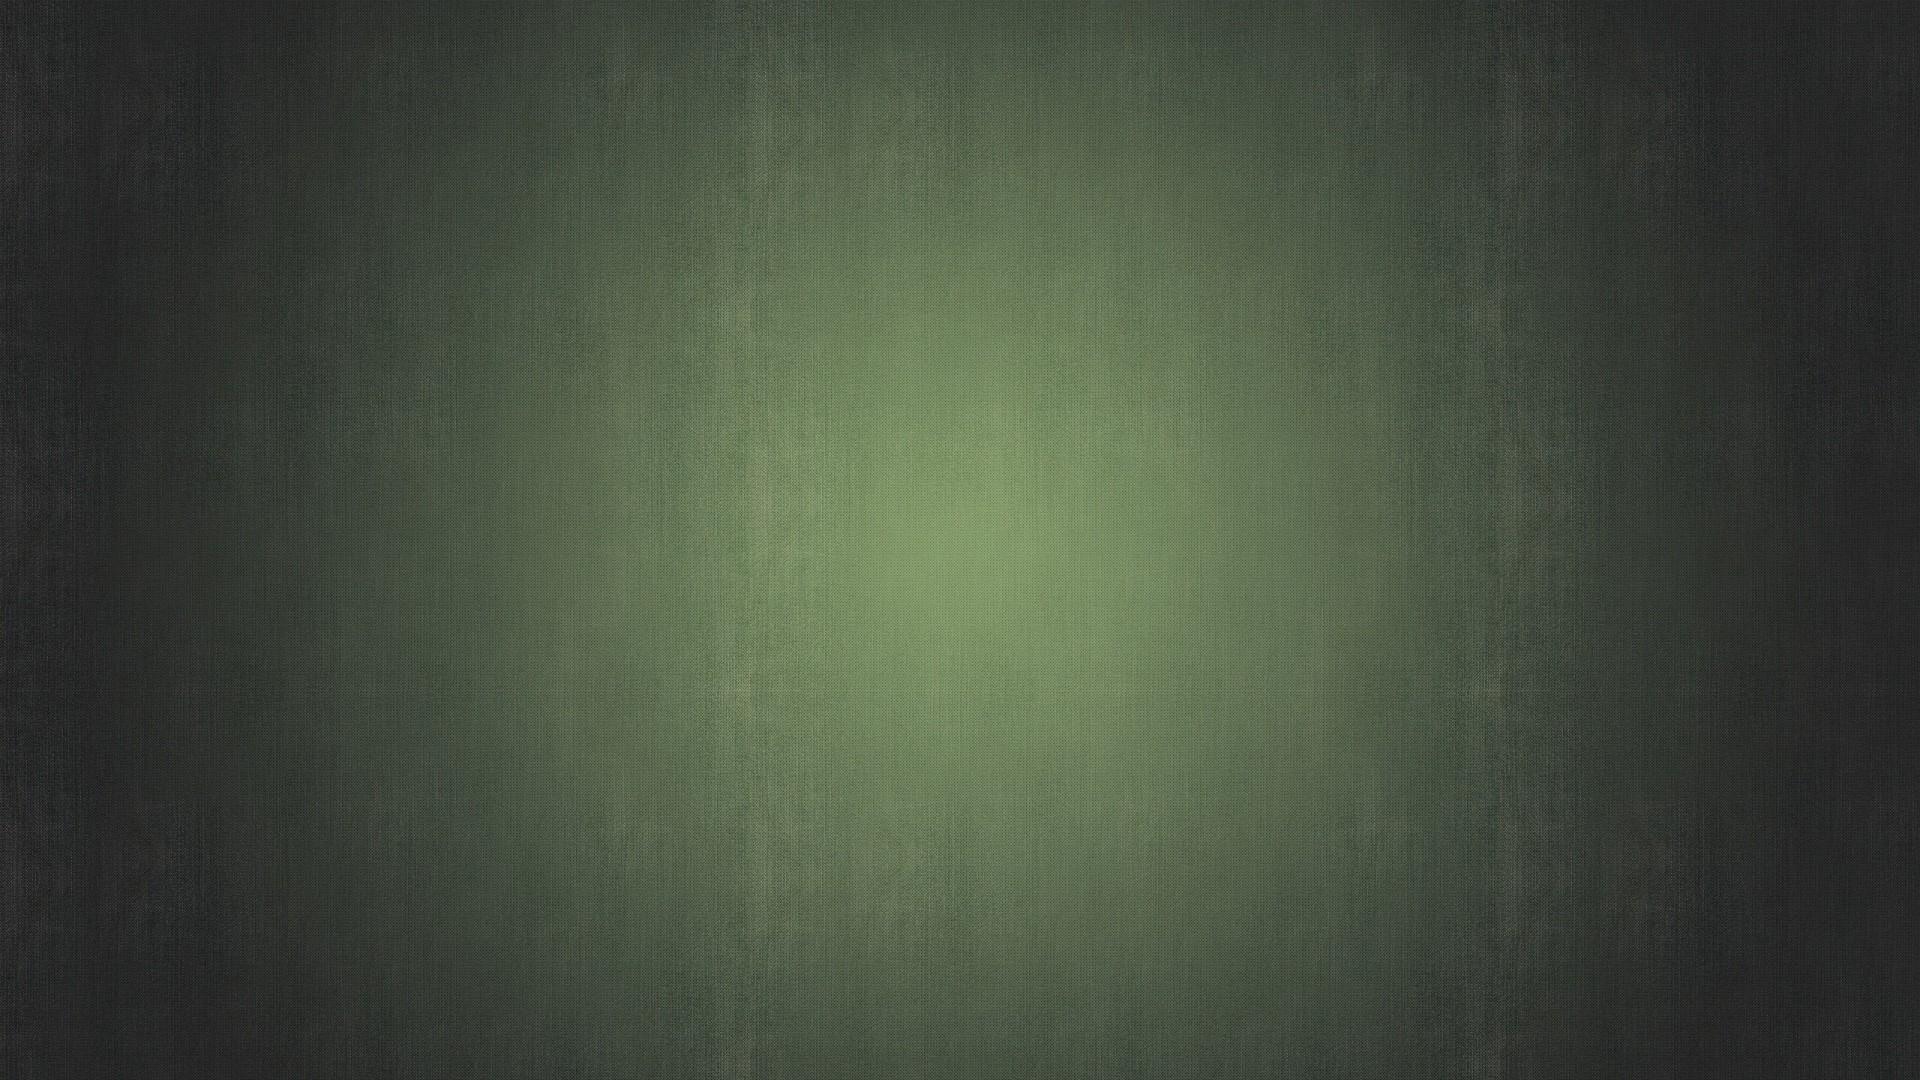 Wallpaper surface, background, plain, …